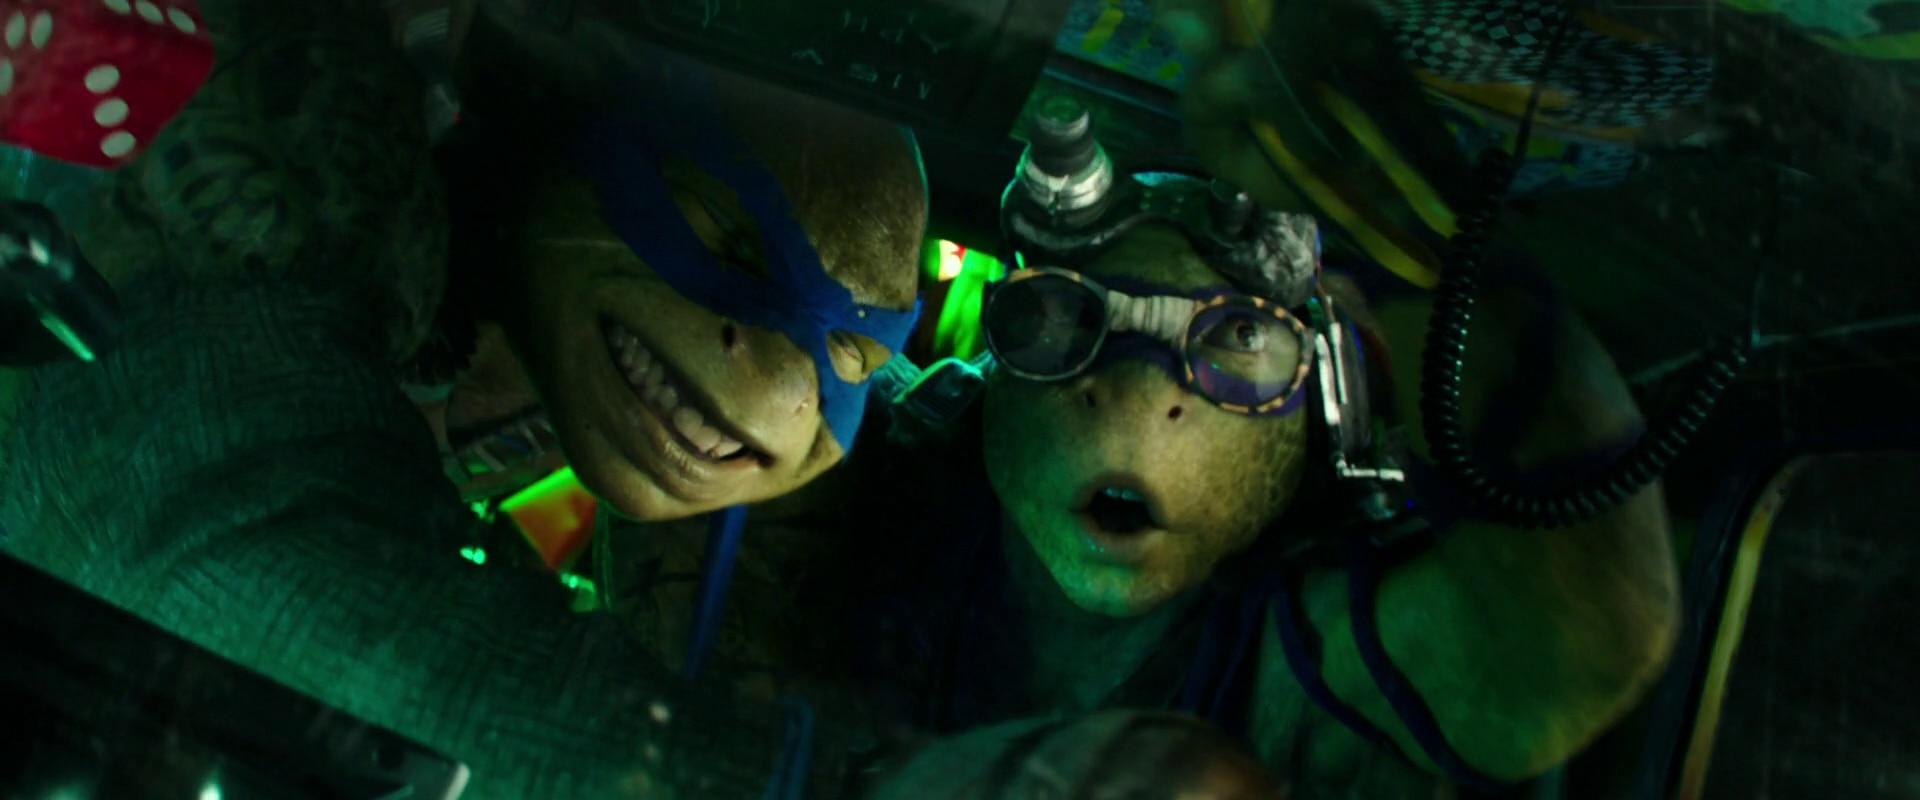 悠悠MP4_MP4电影下载_忍者神龟2:破影而出 Teenage.Mutant.Ninja.Turtles.Out.of.the.Shadows.2016.1080p.BluRay.x26